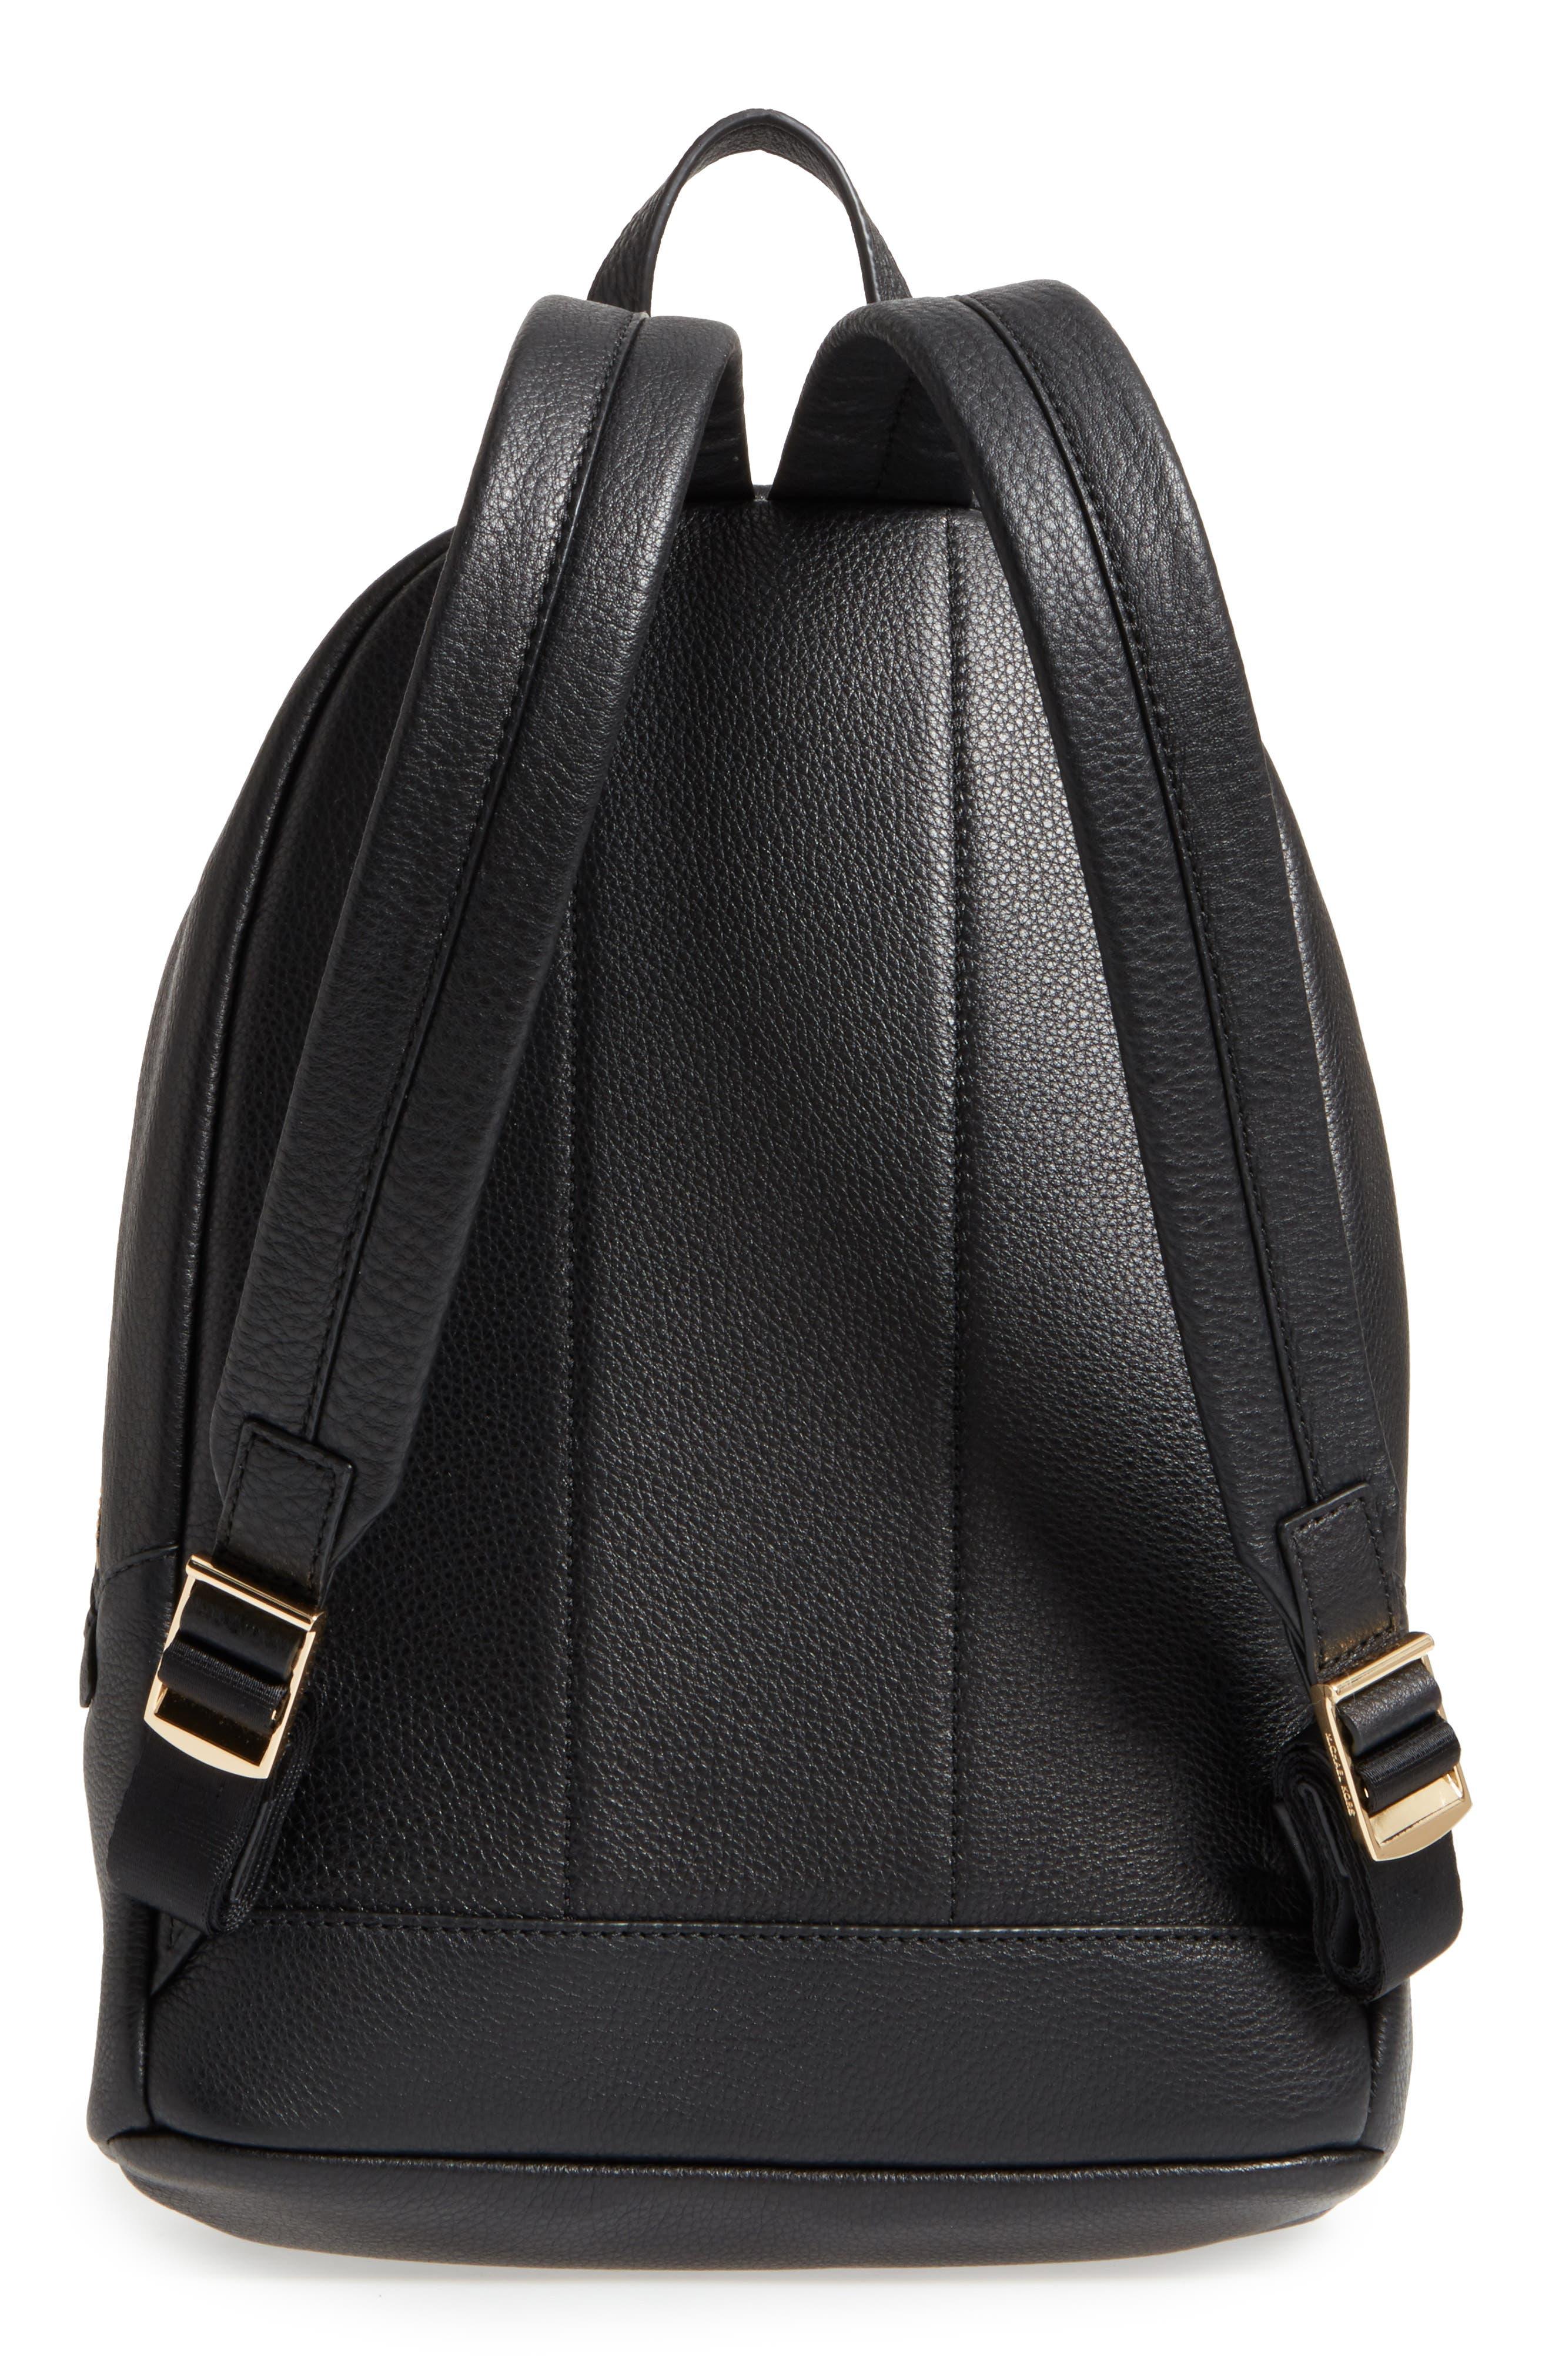 Alternate Image 3  - Michael Kors Large Wythe Studded Leather Backpack